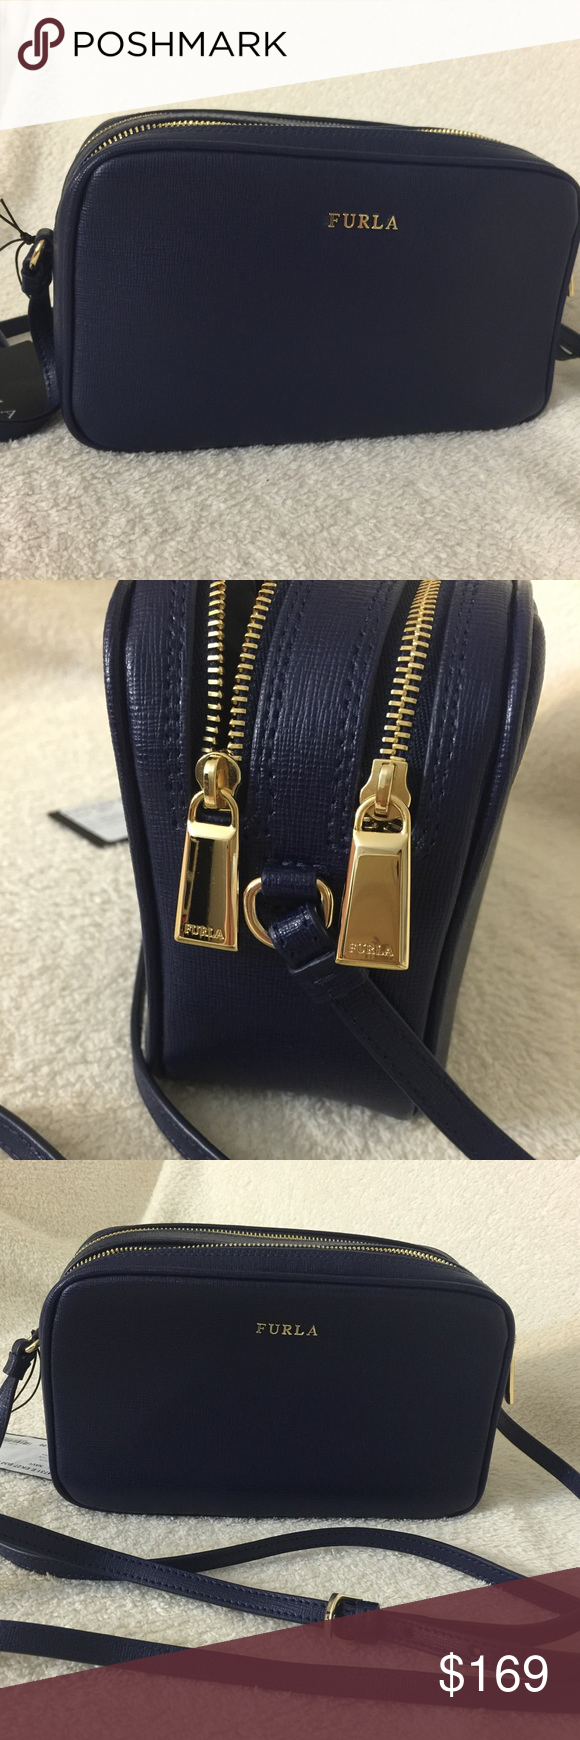 classic shoes 50% off large discount Furla double zip crossbody bag - blue NWT Royal blue color ...